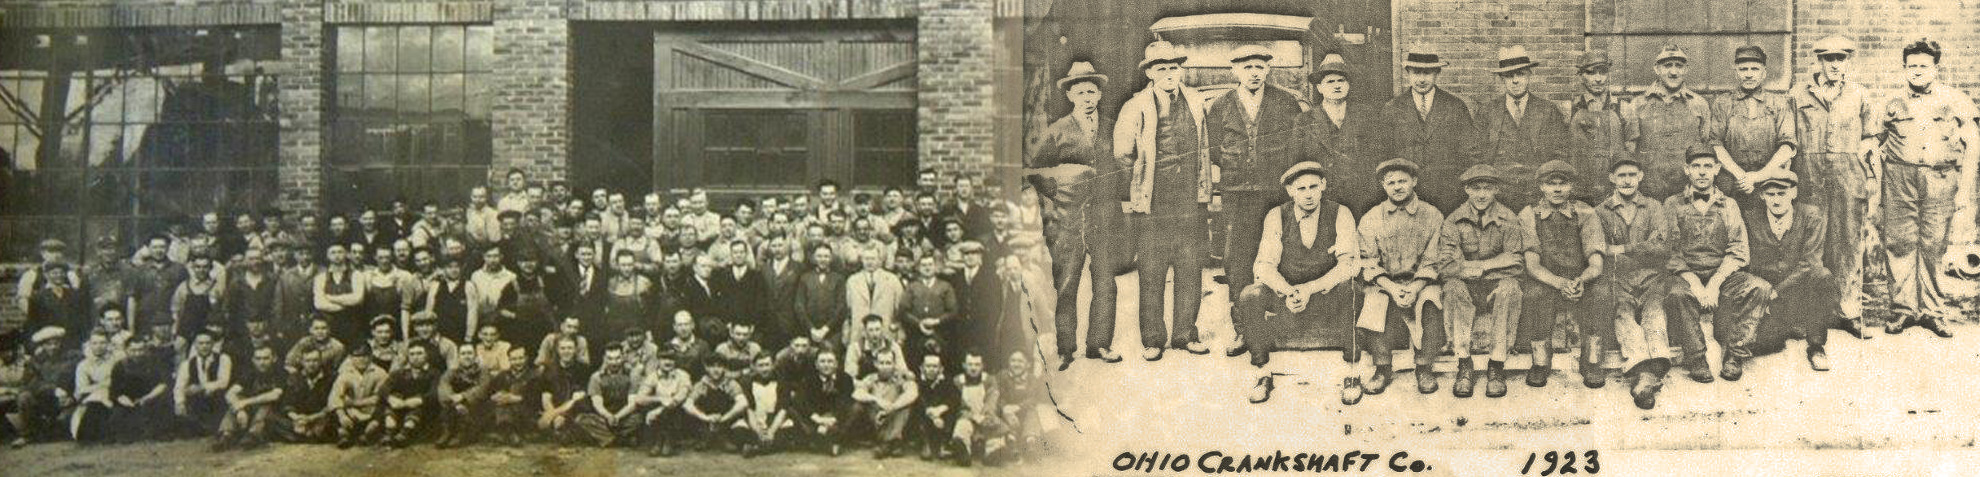 Ohio Crankshaft Company History